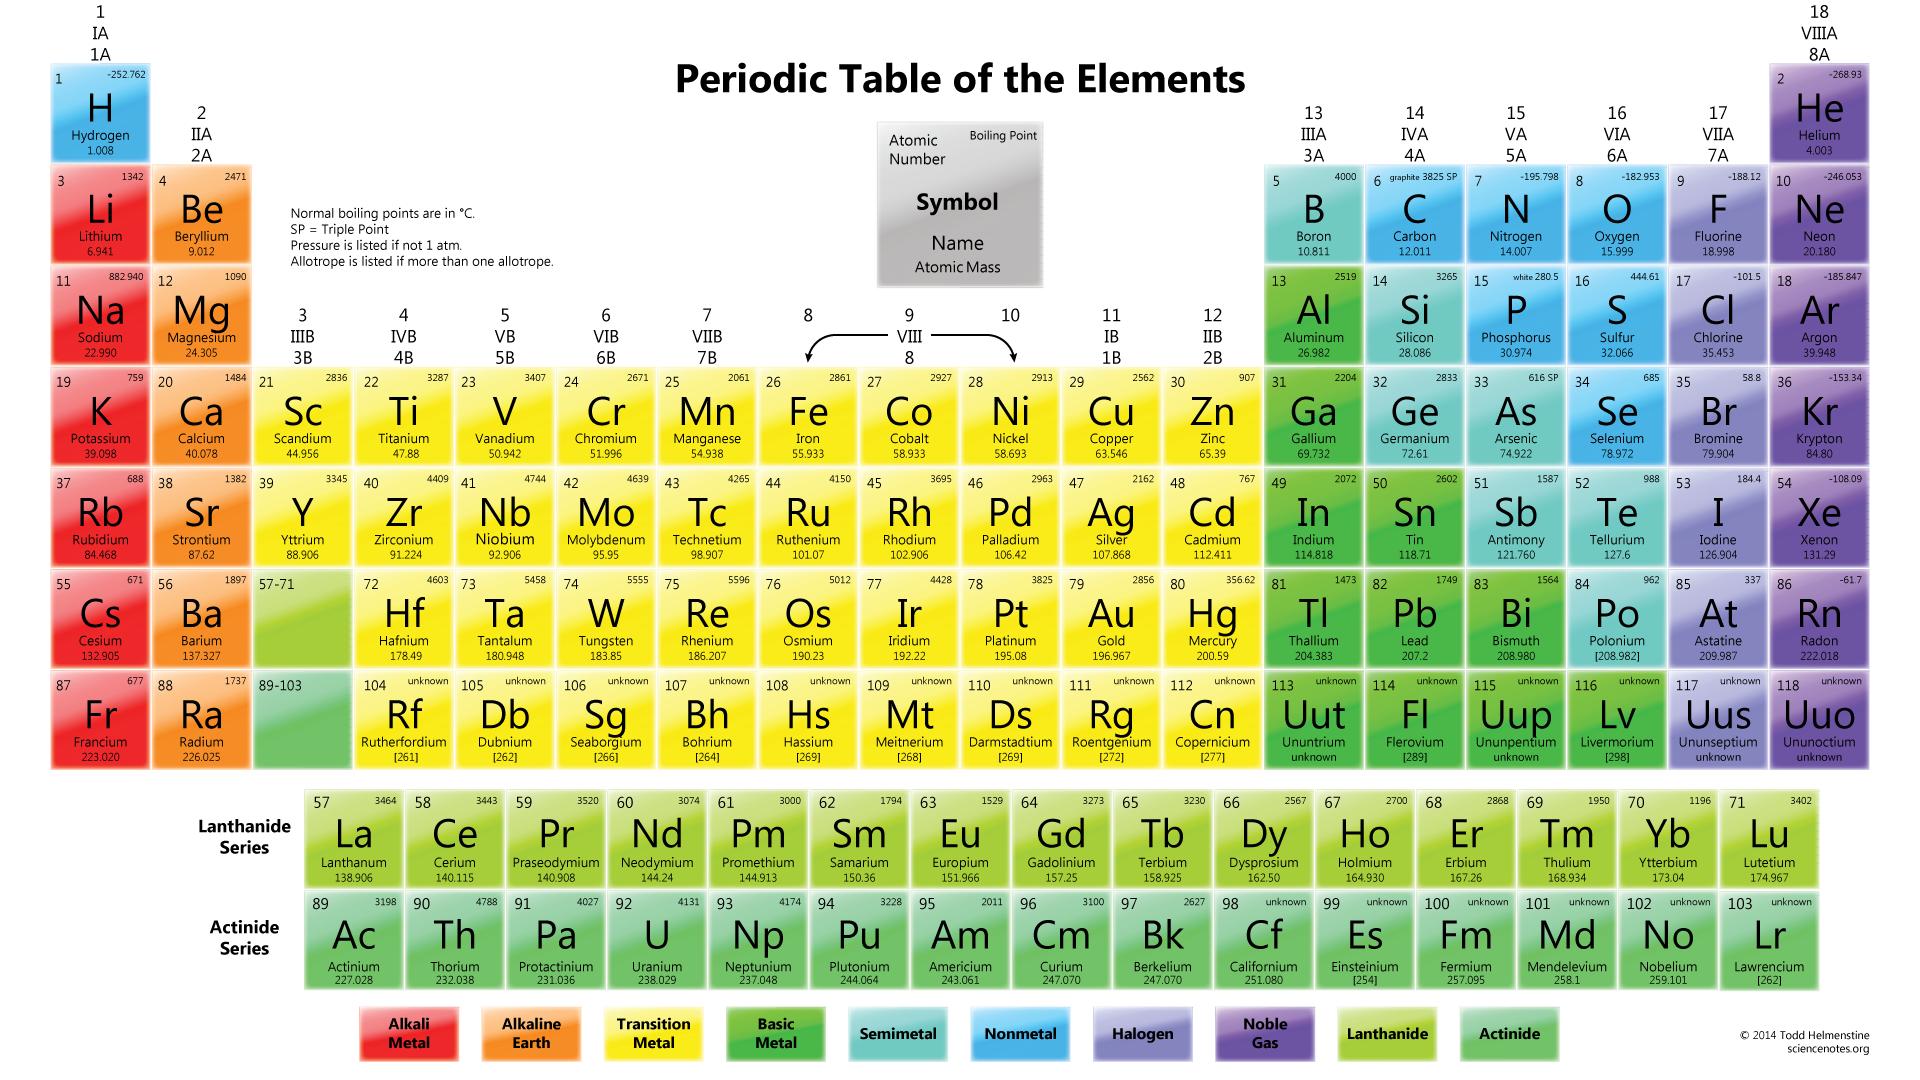 Periodic table in hindi wikipedia periodic diagrams science periodic table in hindi wikipedia diagrams science gamestrikefo Image collections